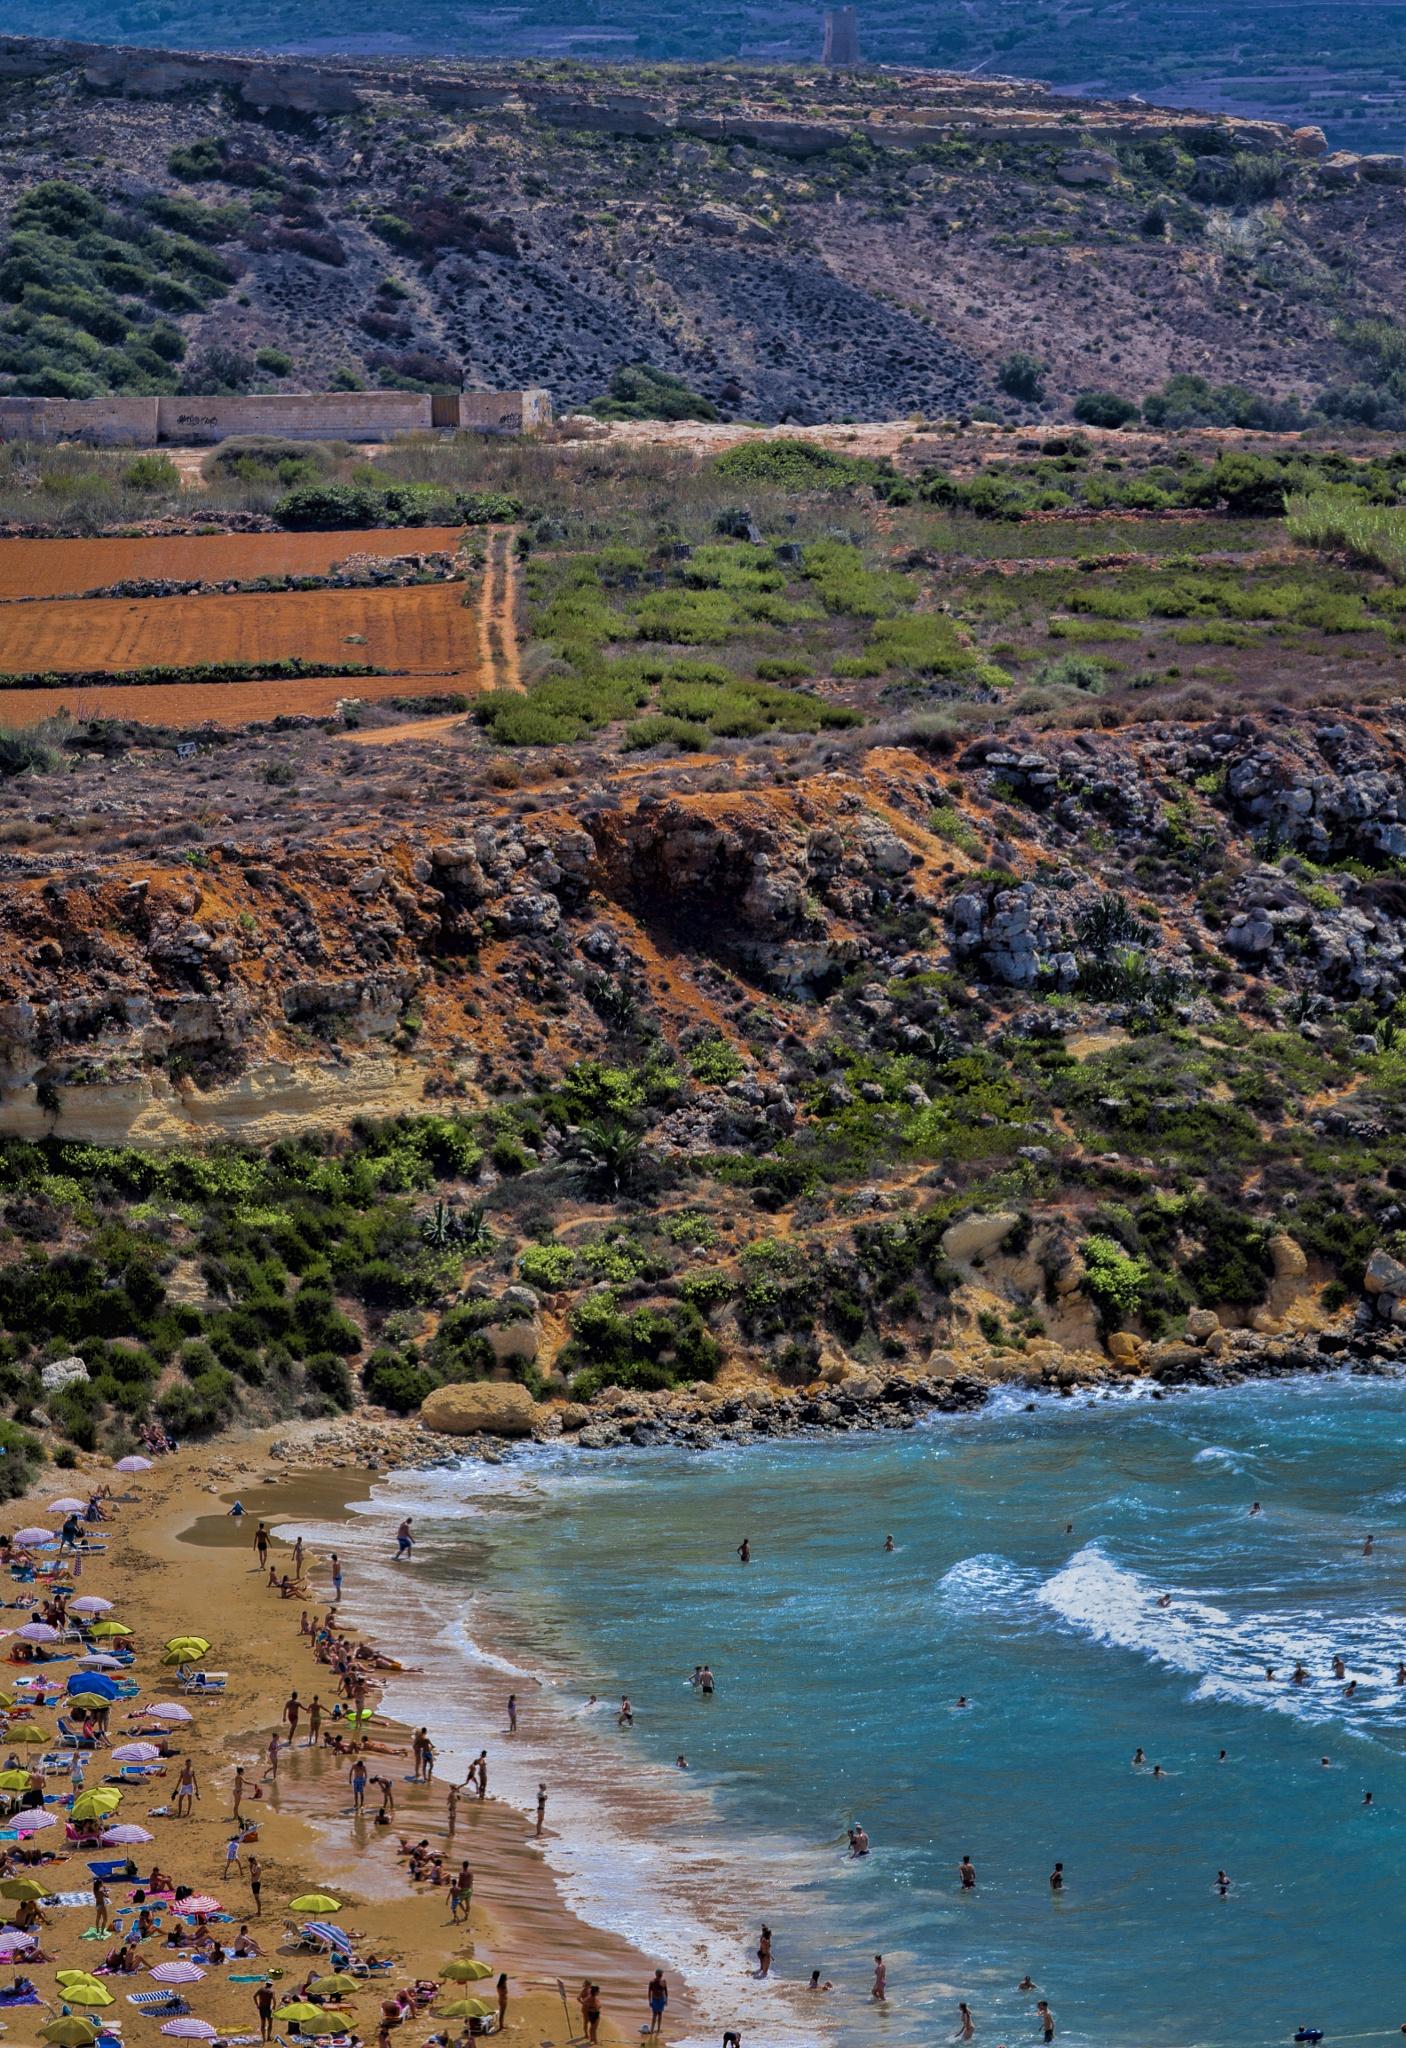 Sandy beach in Malta by Henri Mattocks